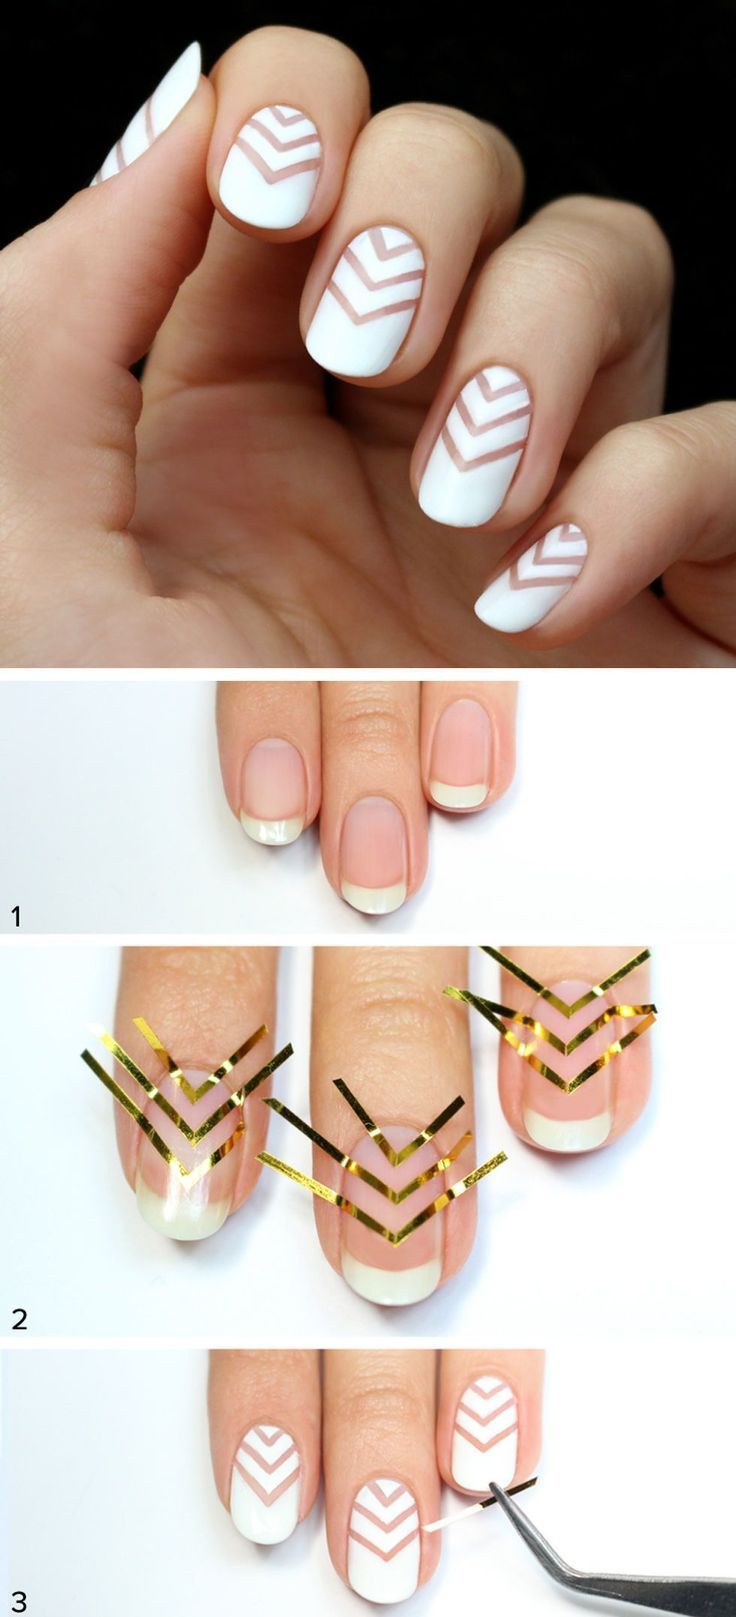 Chevron #manicures #beautyhacks #ManicureDIY